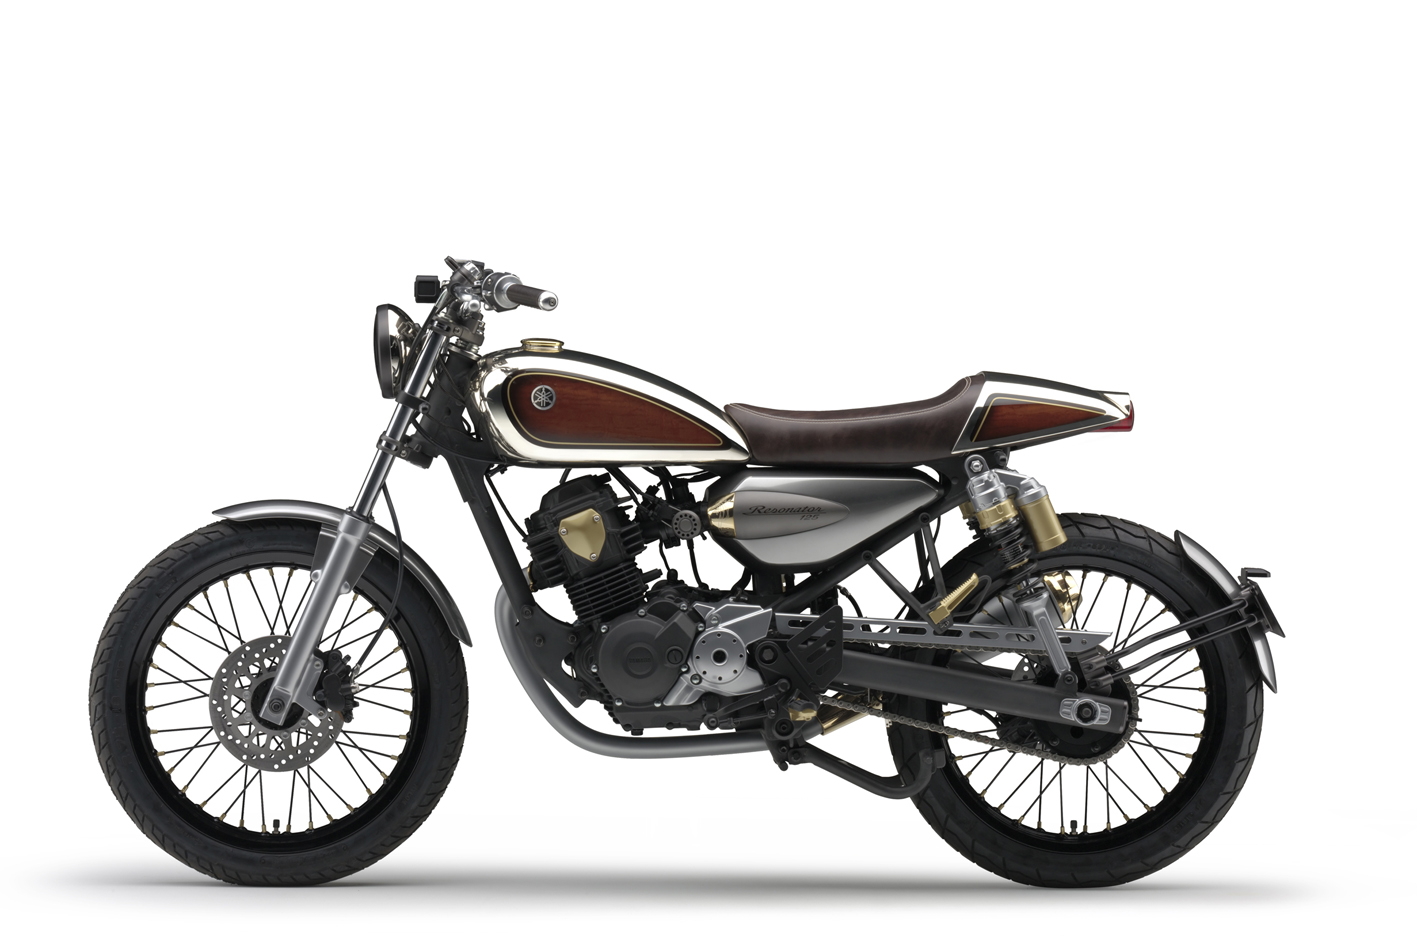 Yamaha Resonator 125 concept